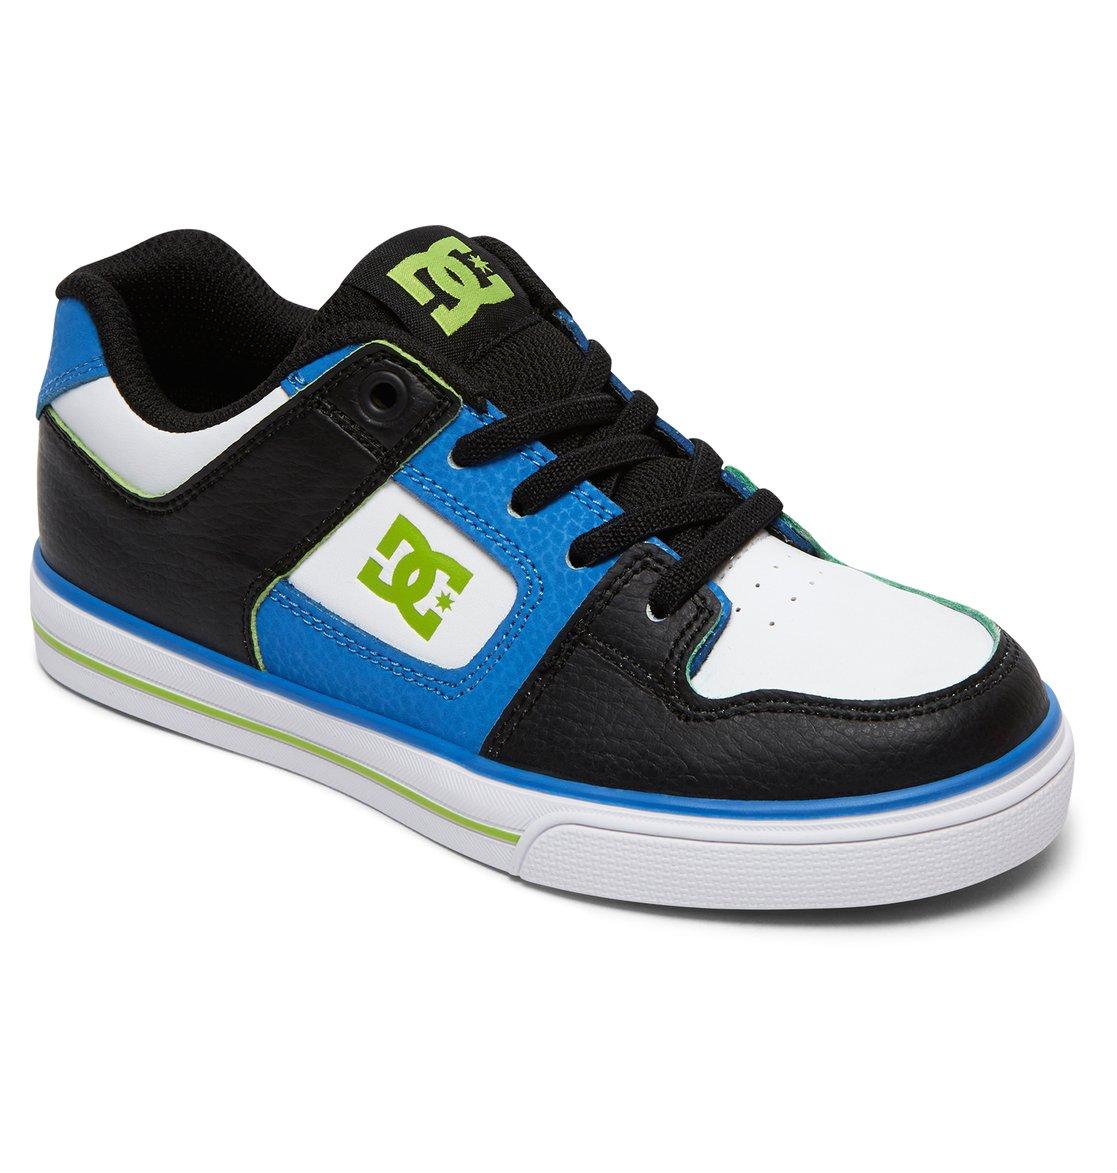 4515307fd Download (800x660) · Кеды для мальчиков-подростков DC SHOES Pure Elastic Se  B Blue/Black/White Download (1117x1173) · DC Kids Rebound Boys Shoes ...